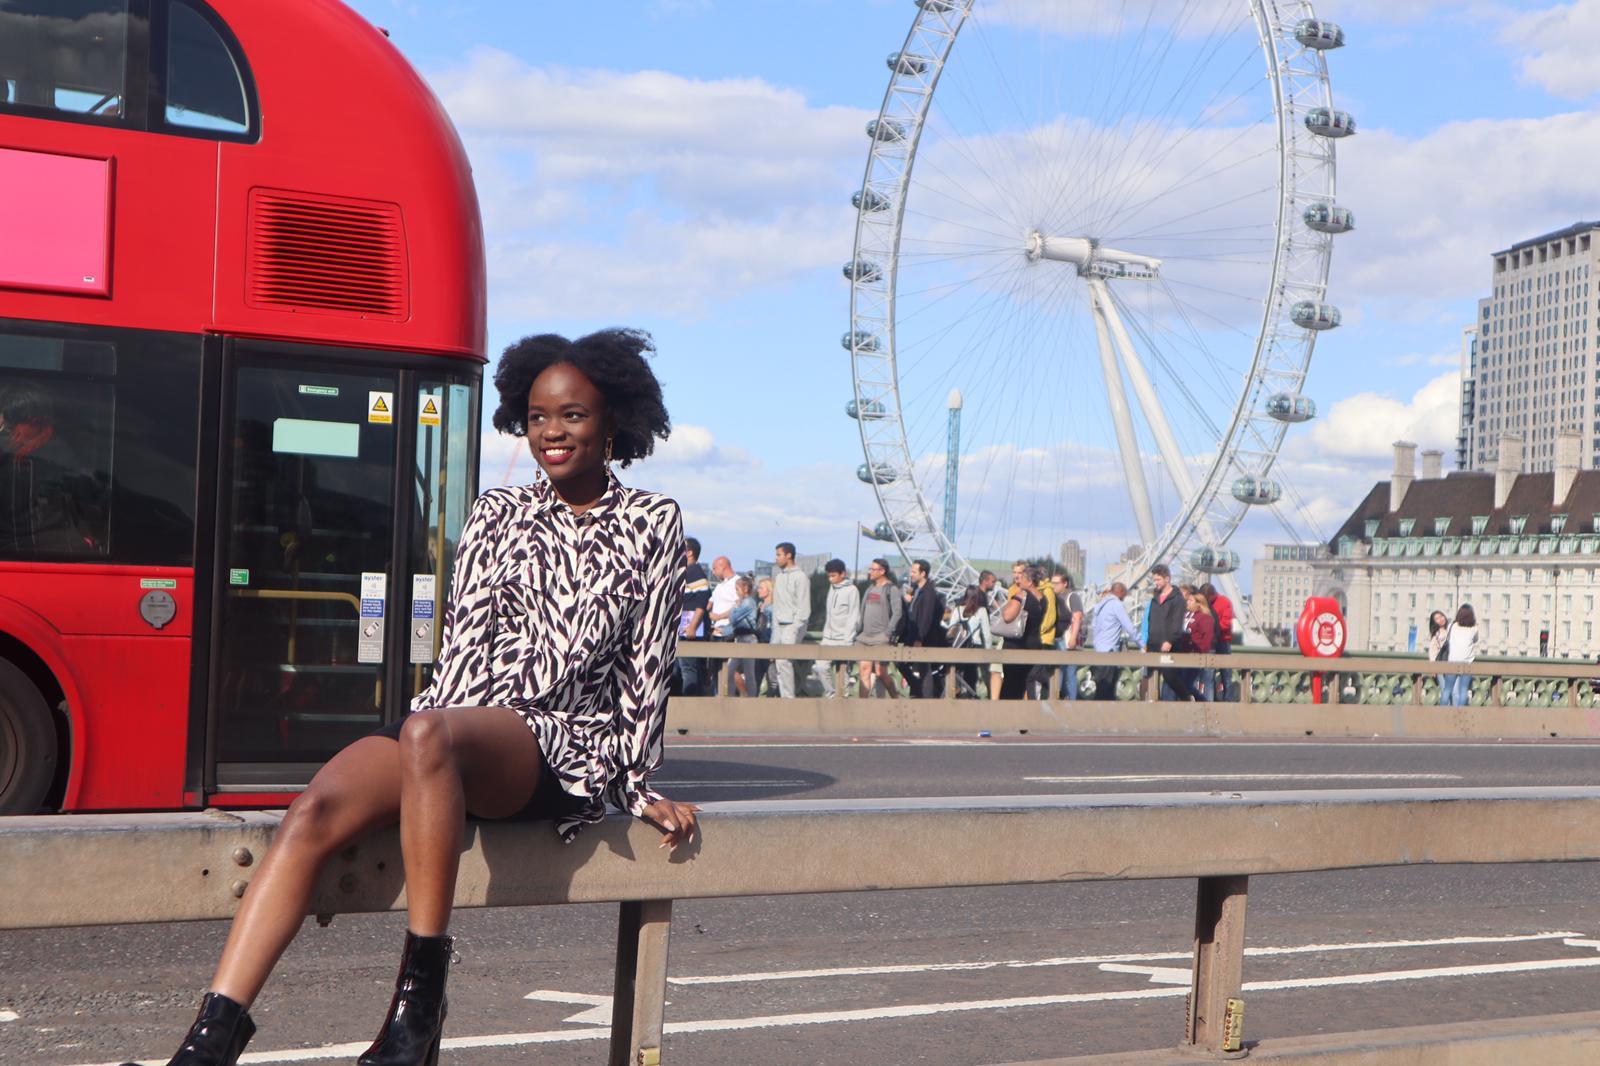 Shot taken in London, United Kingdom